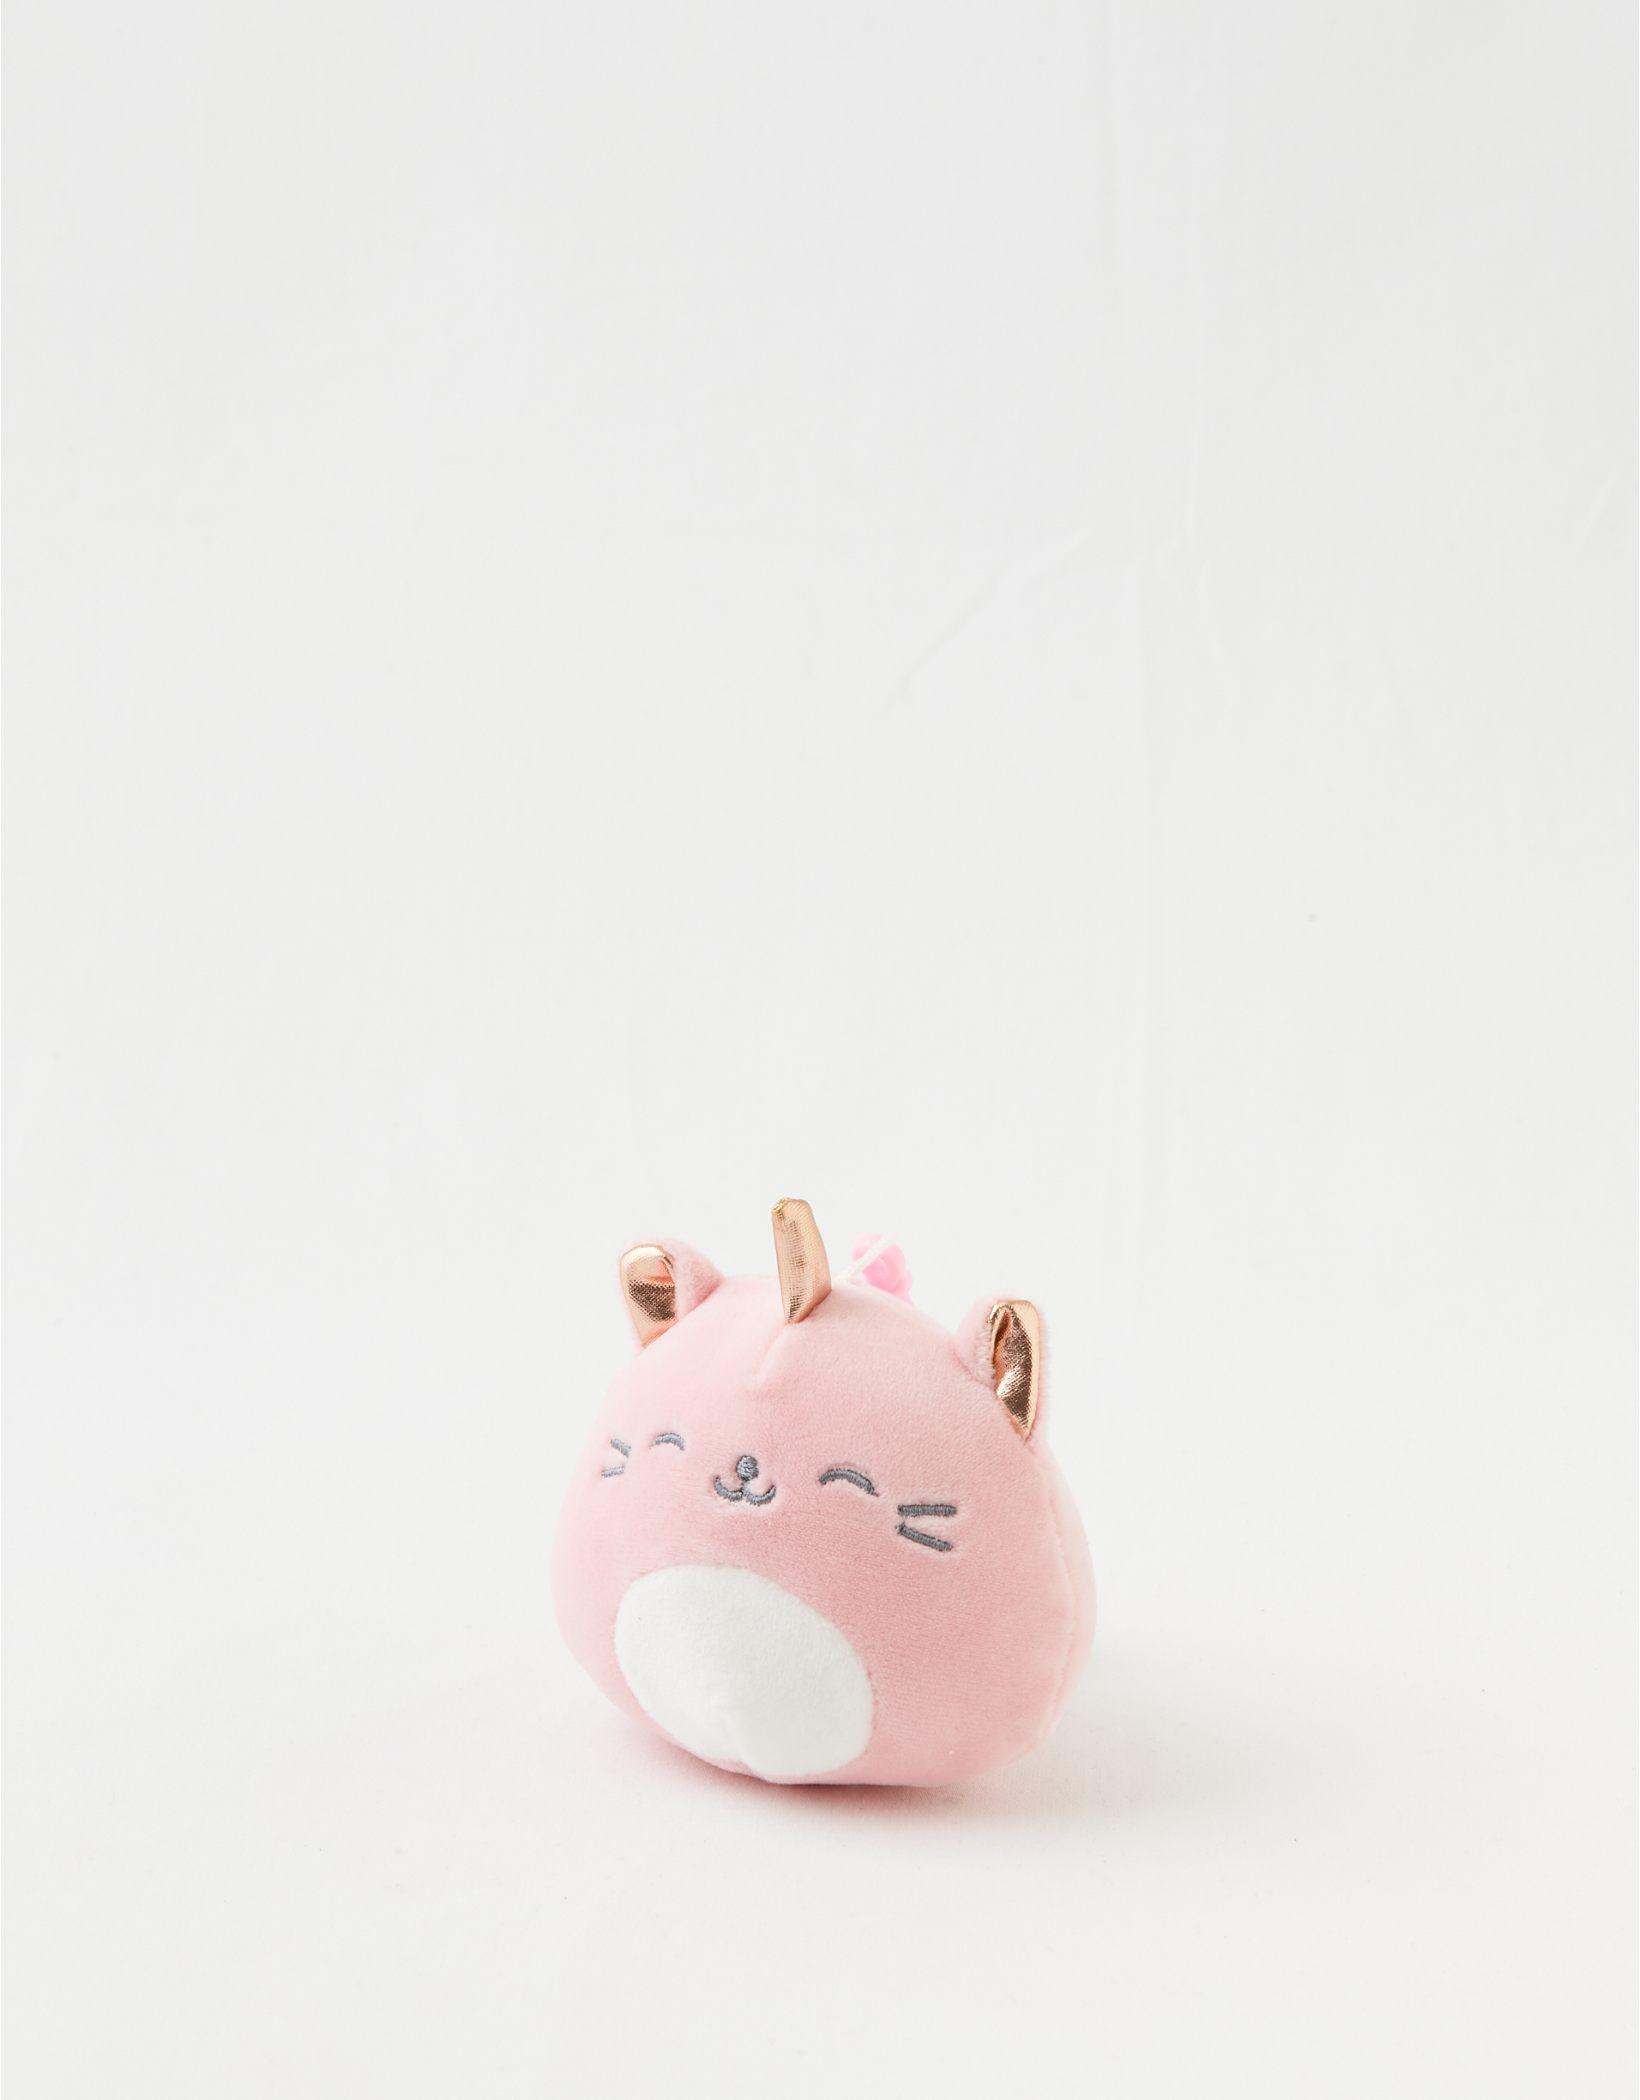 Squishmallow Clip On 3.5 in Plush Toy - Araminta